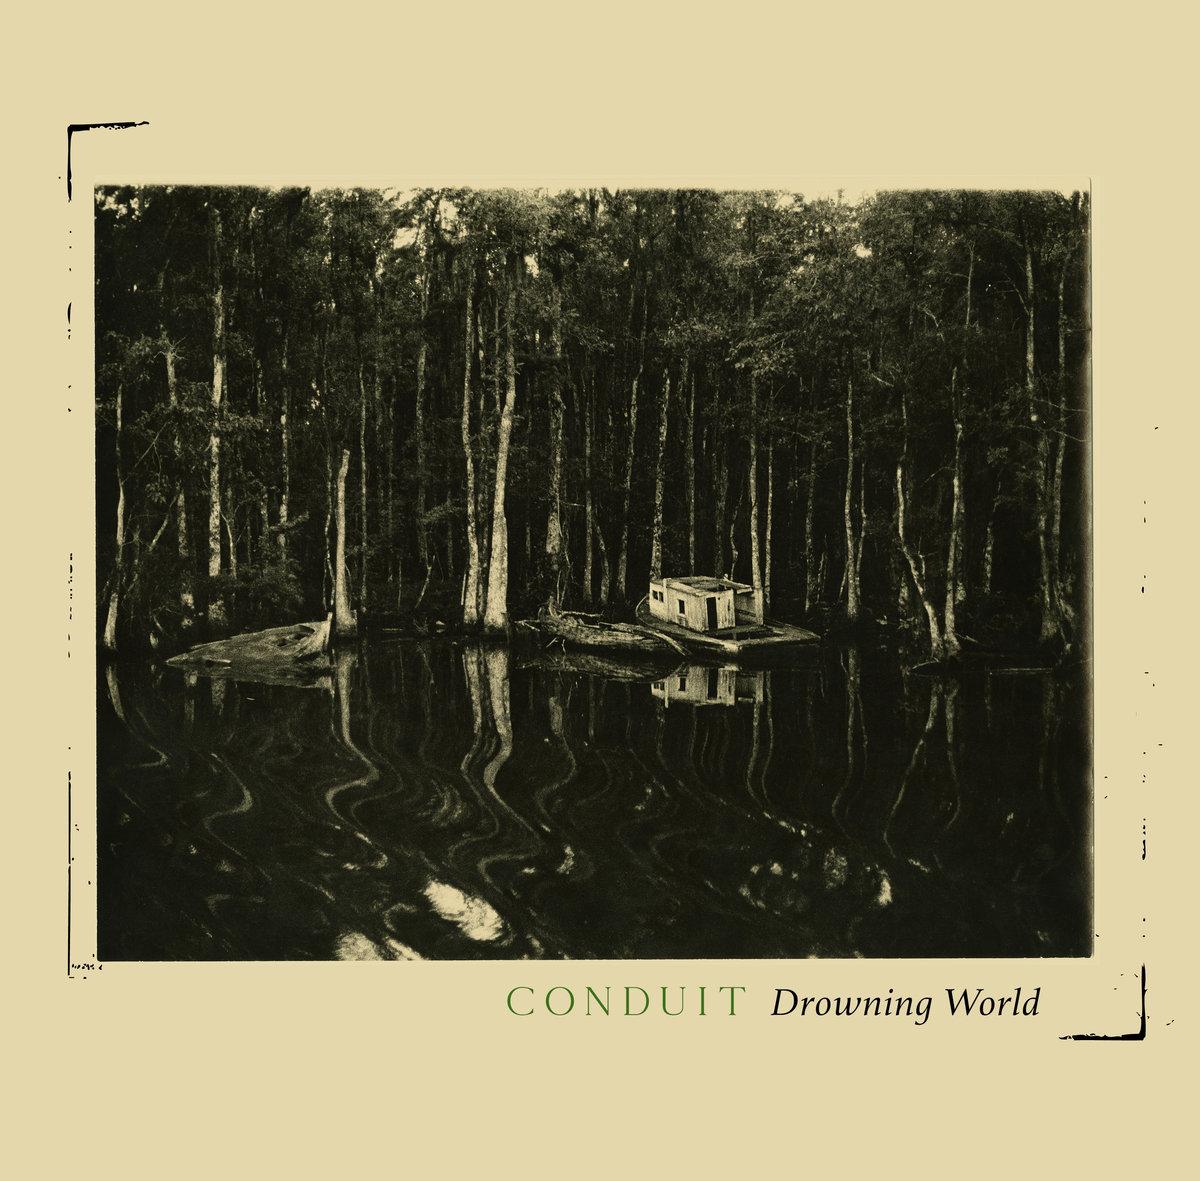 Conduit - Drowning World